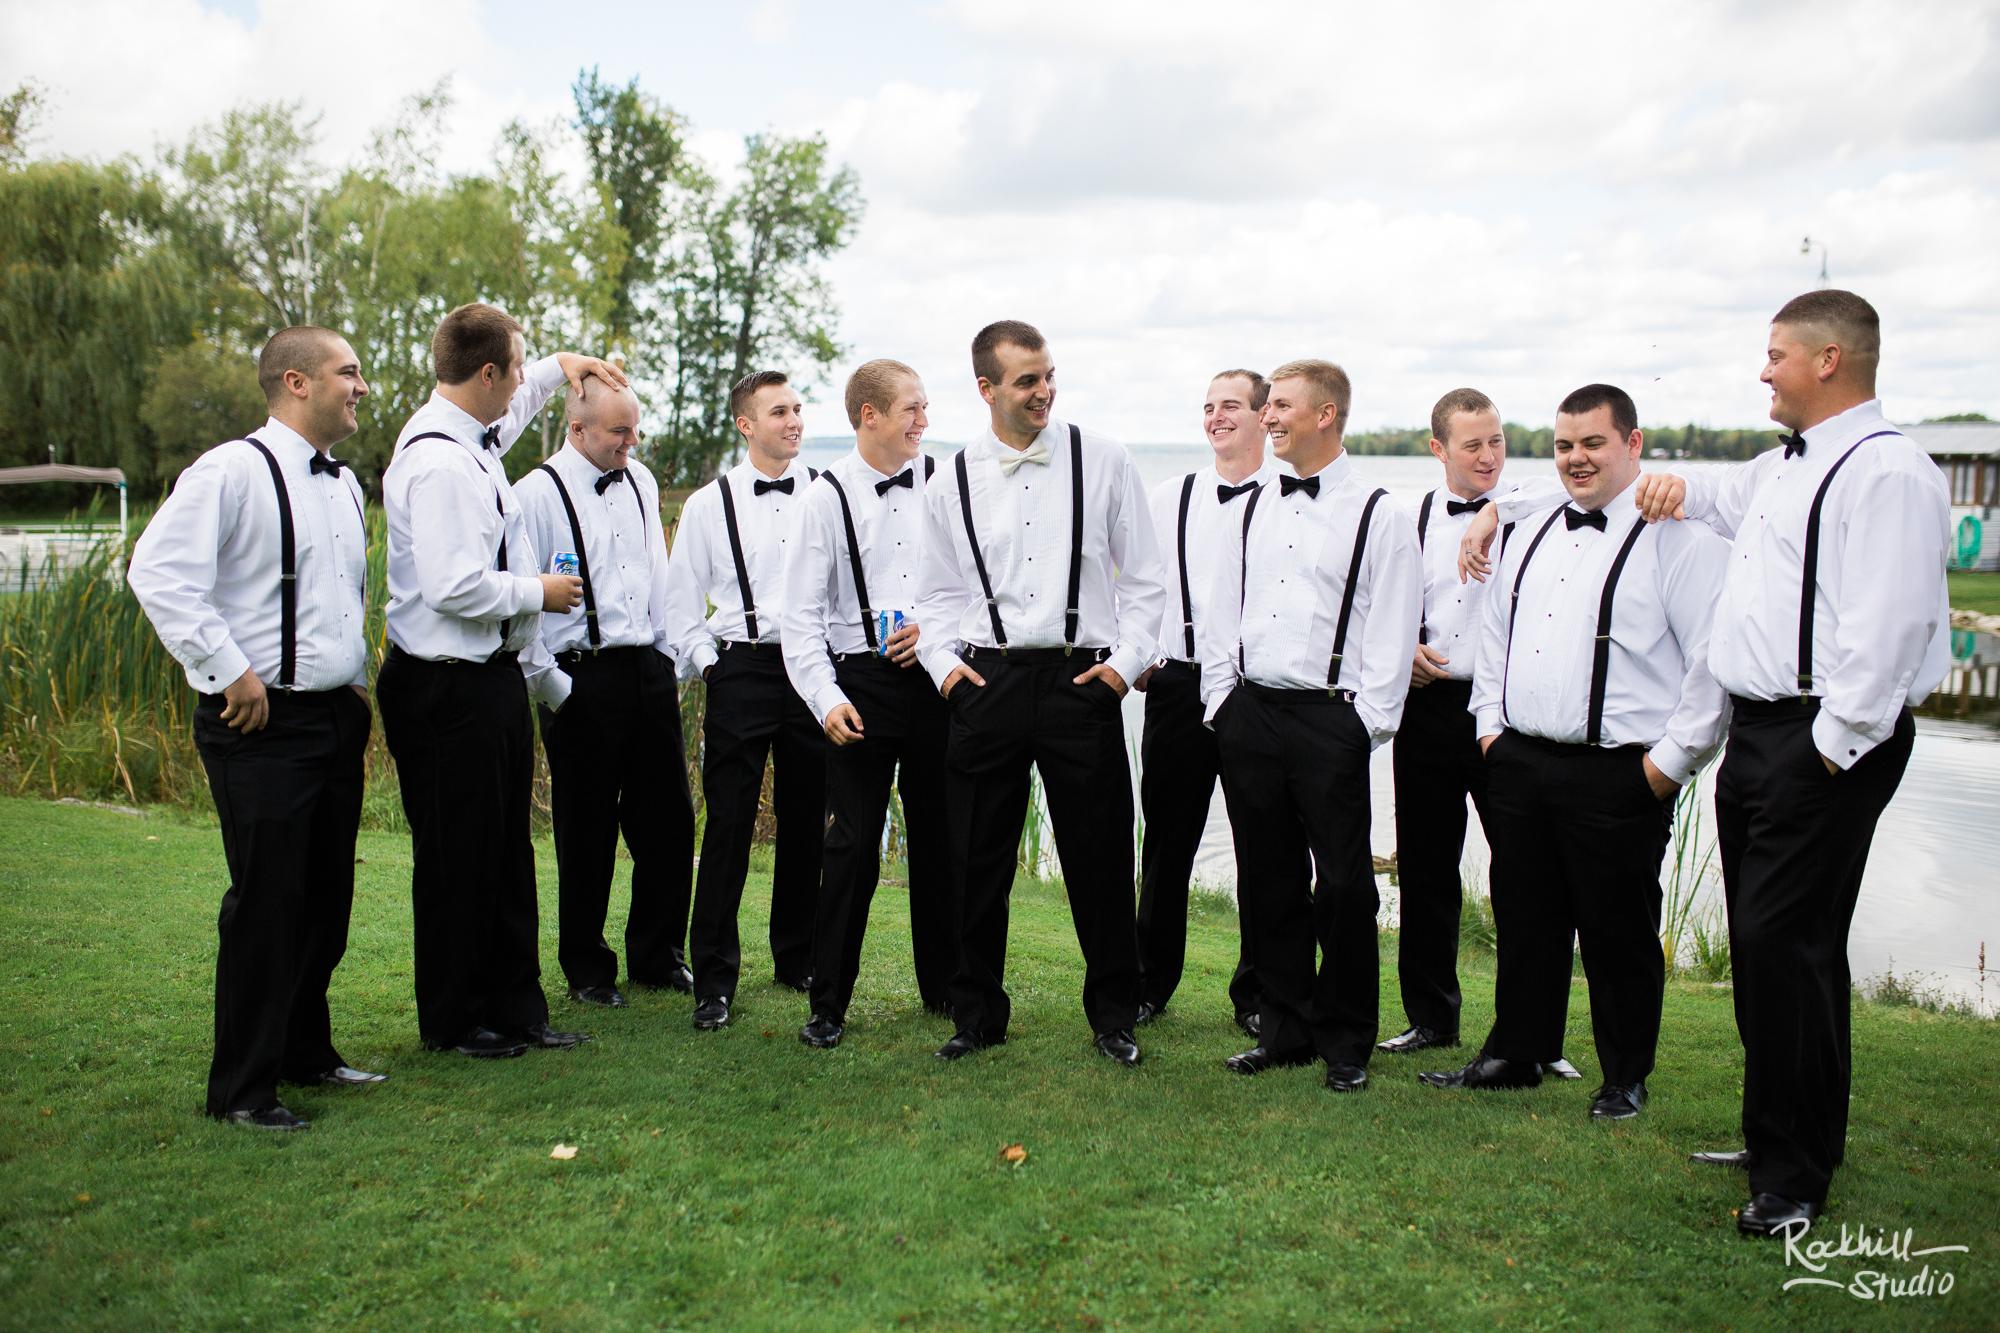 rockhill-studio-marquette-michigan-upper-peninsula-wedding-groomen-candid-photography.jpg